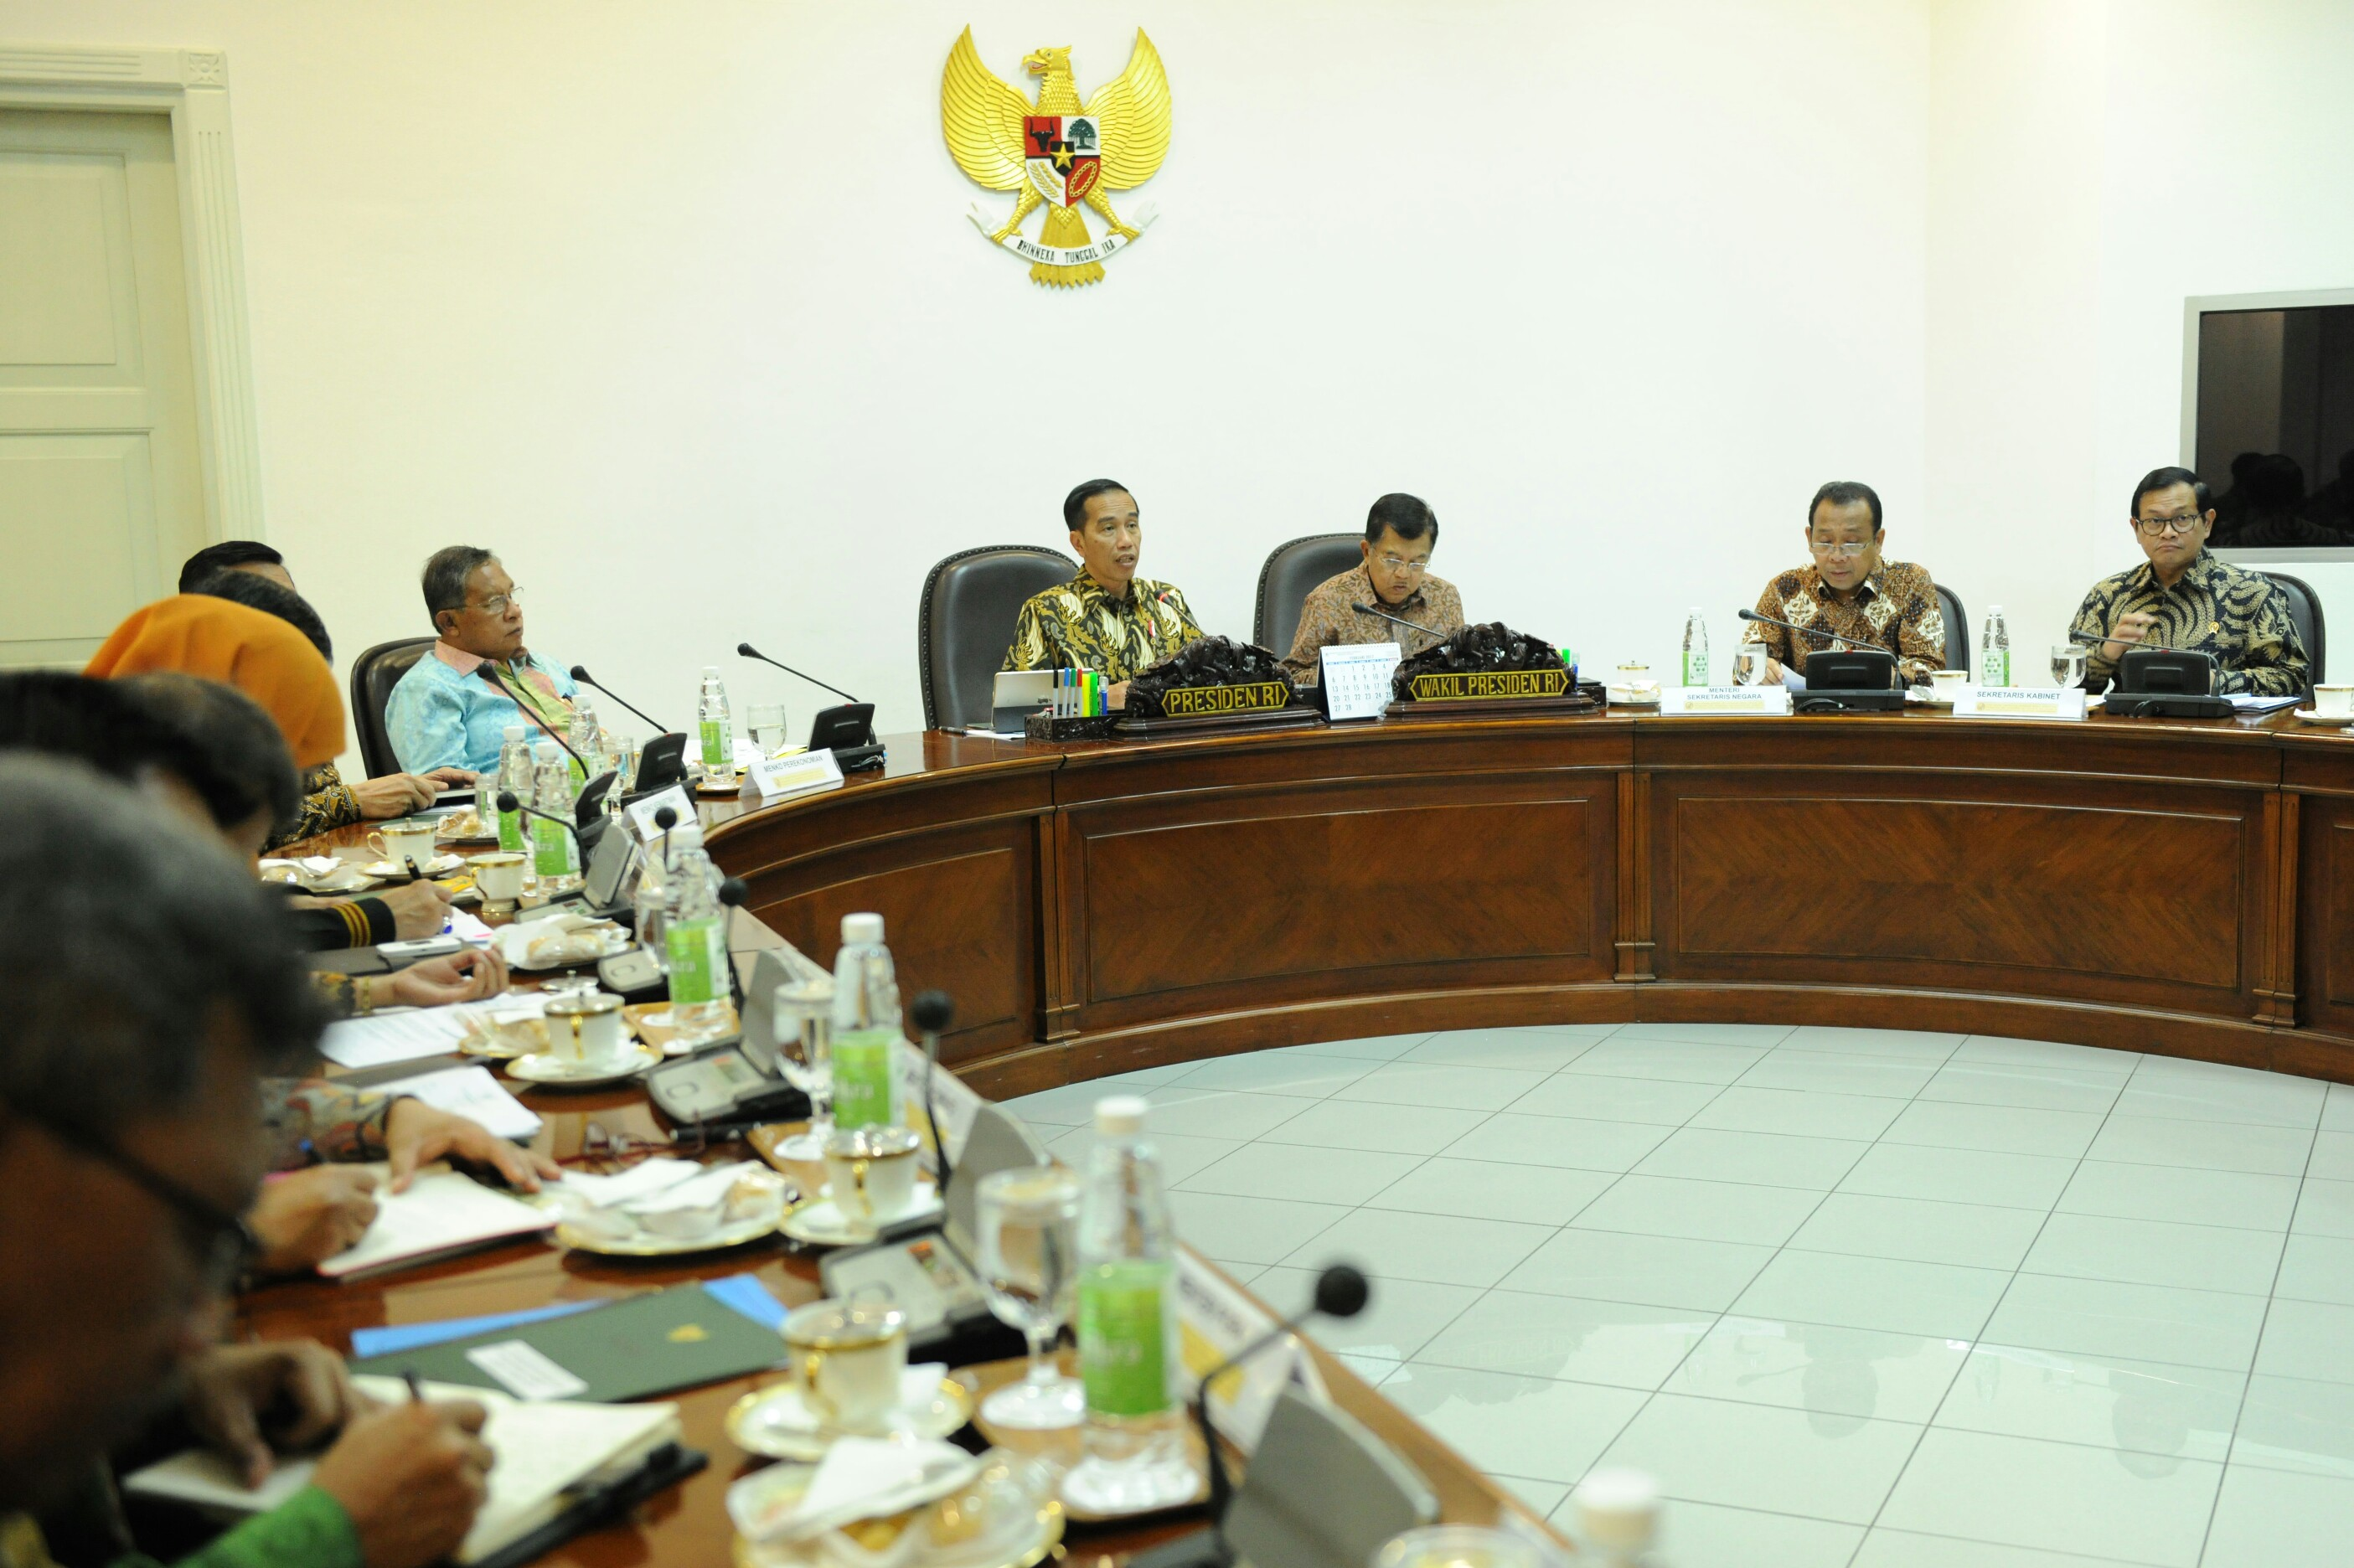 Presiden Jokowi didampingi Wapres Jusuf Kalla memimpin rapat terbatas masalah pertembakauan, di Kantor Presiden, Jakarta, Selasa (14/3) siang. (Foto: Rahmat/Humas)